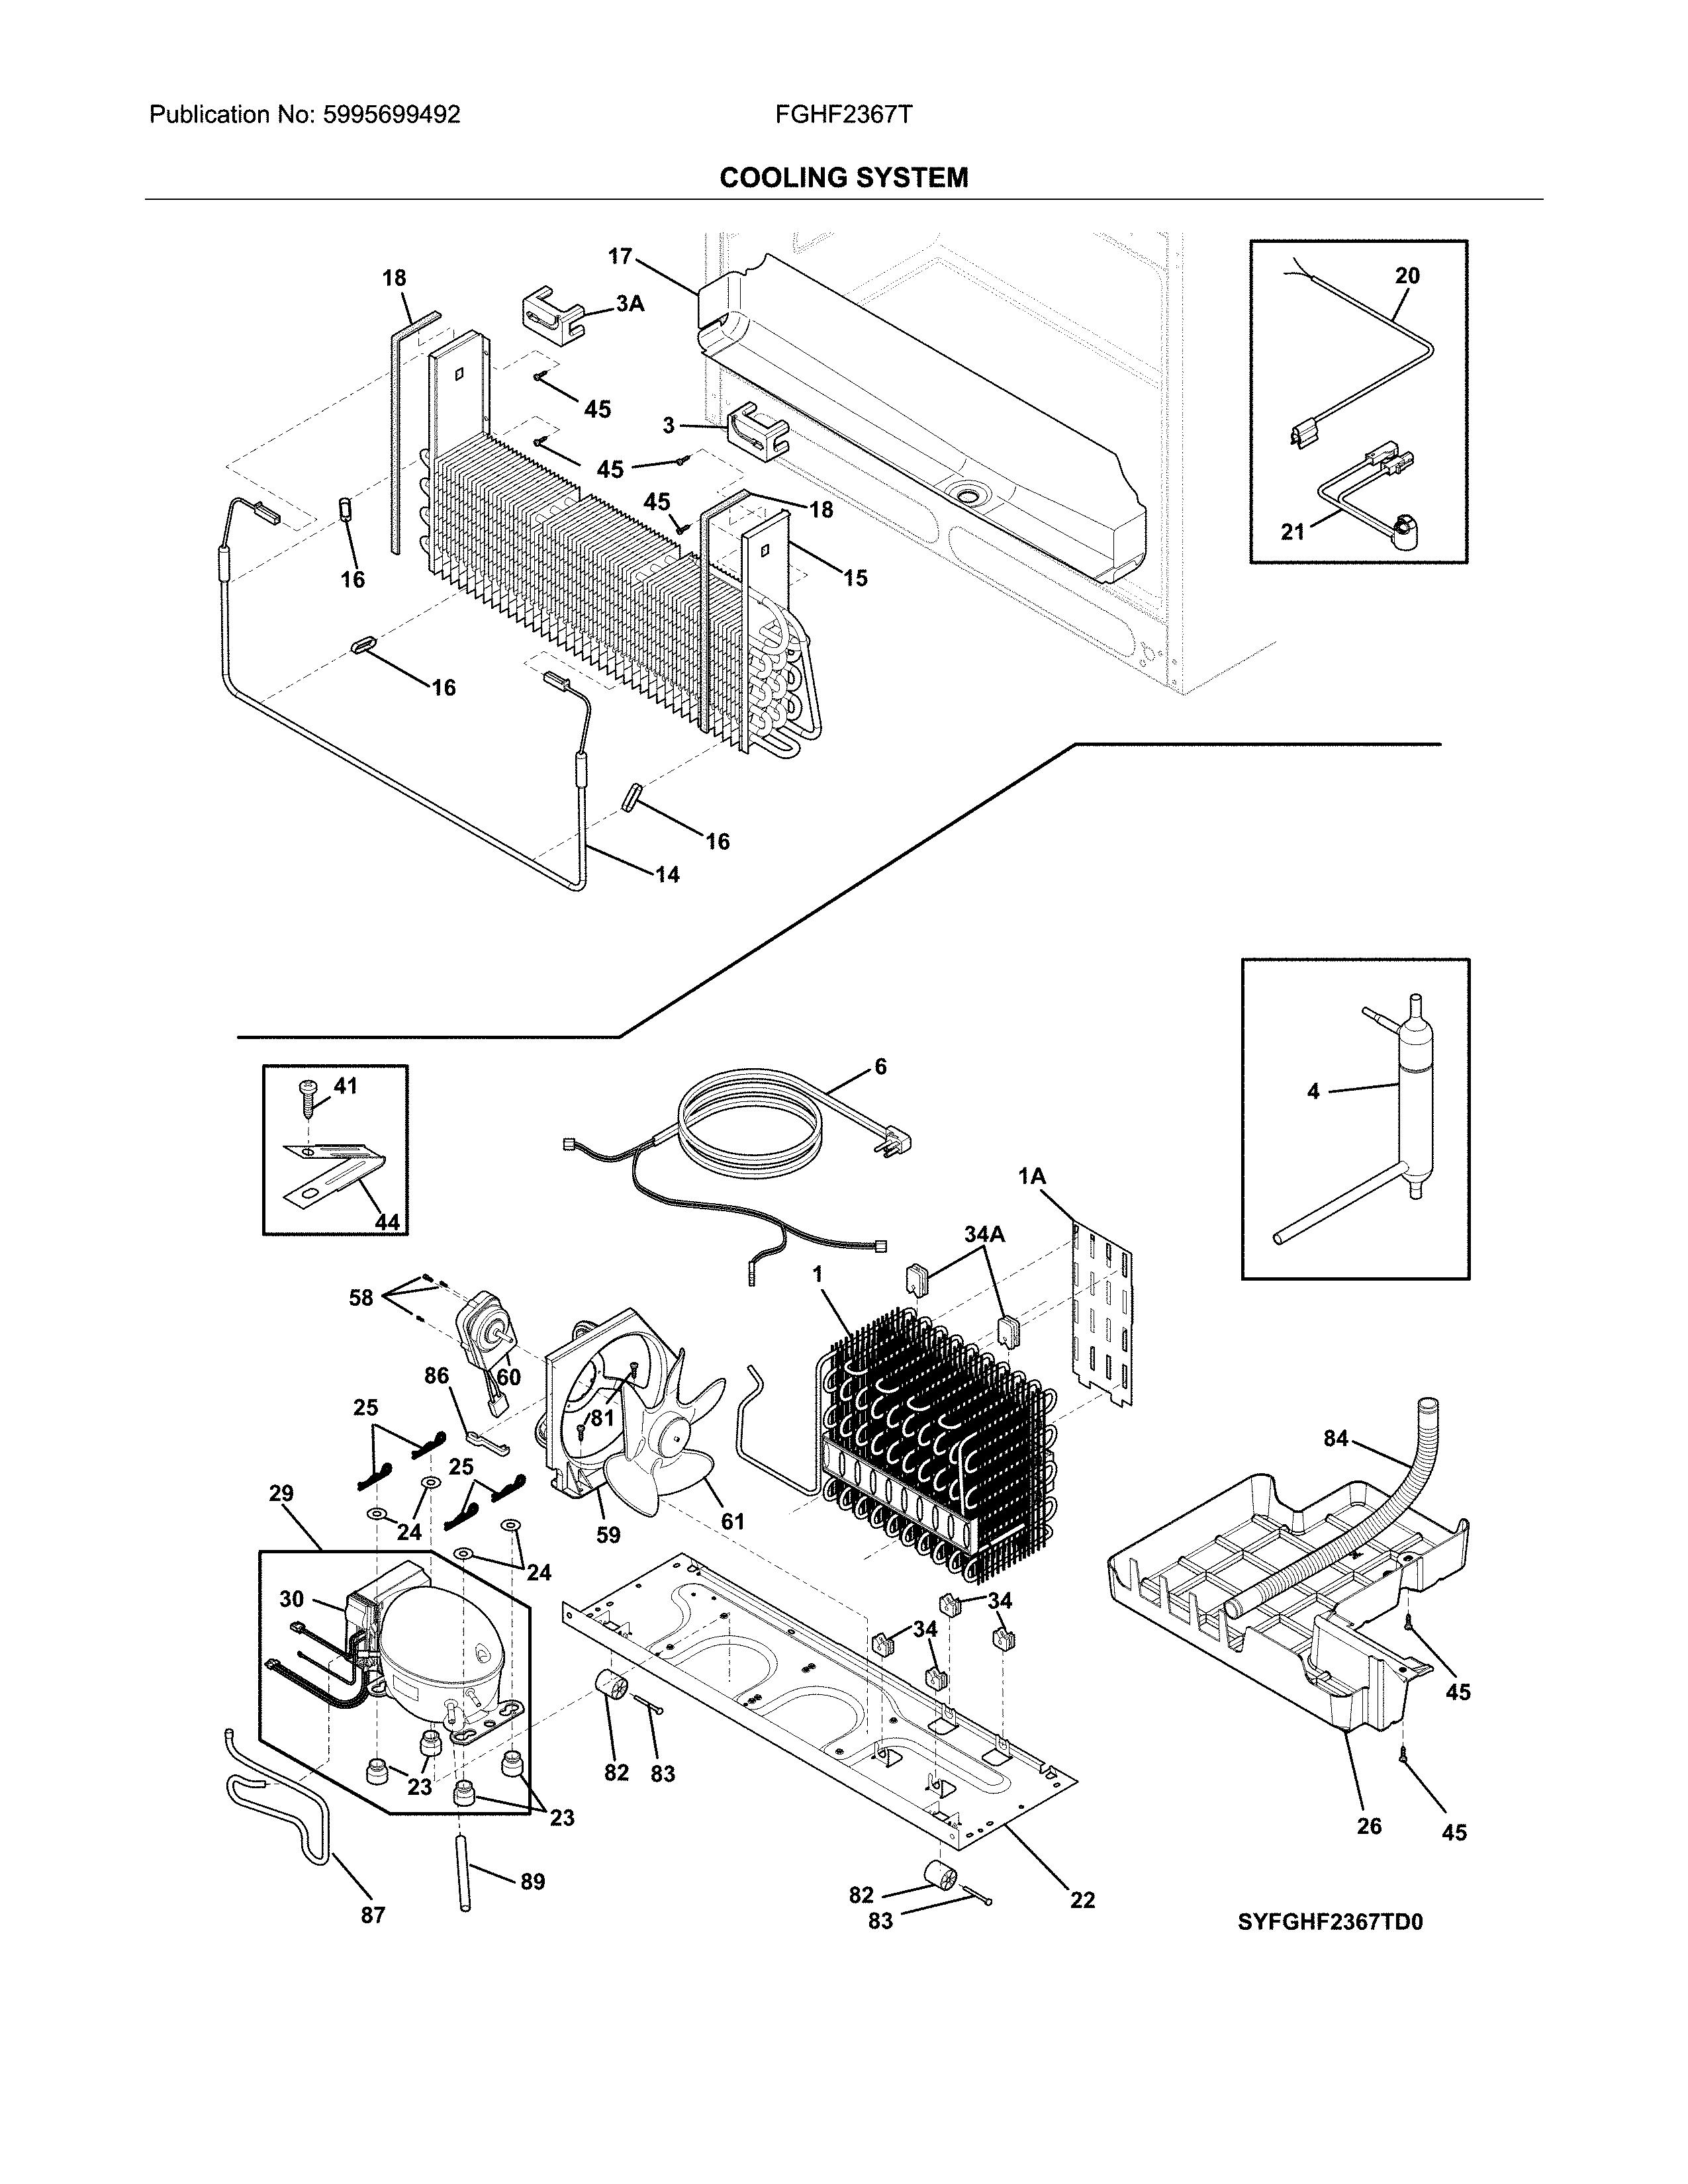 Frigidaire model FGHF2367TD1 bottom-mount refrigerator